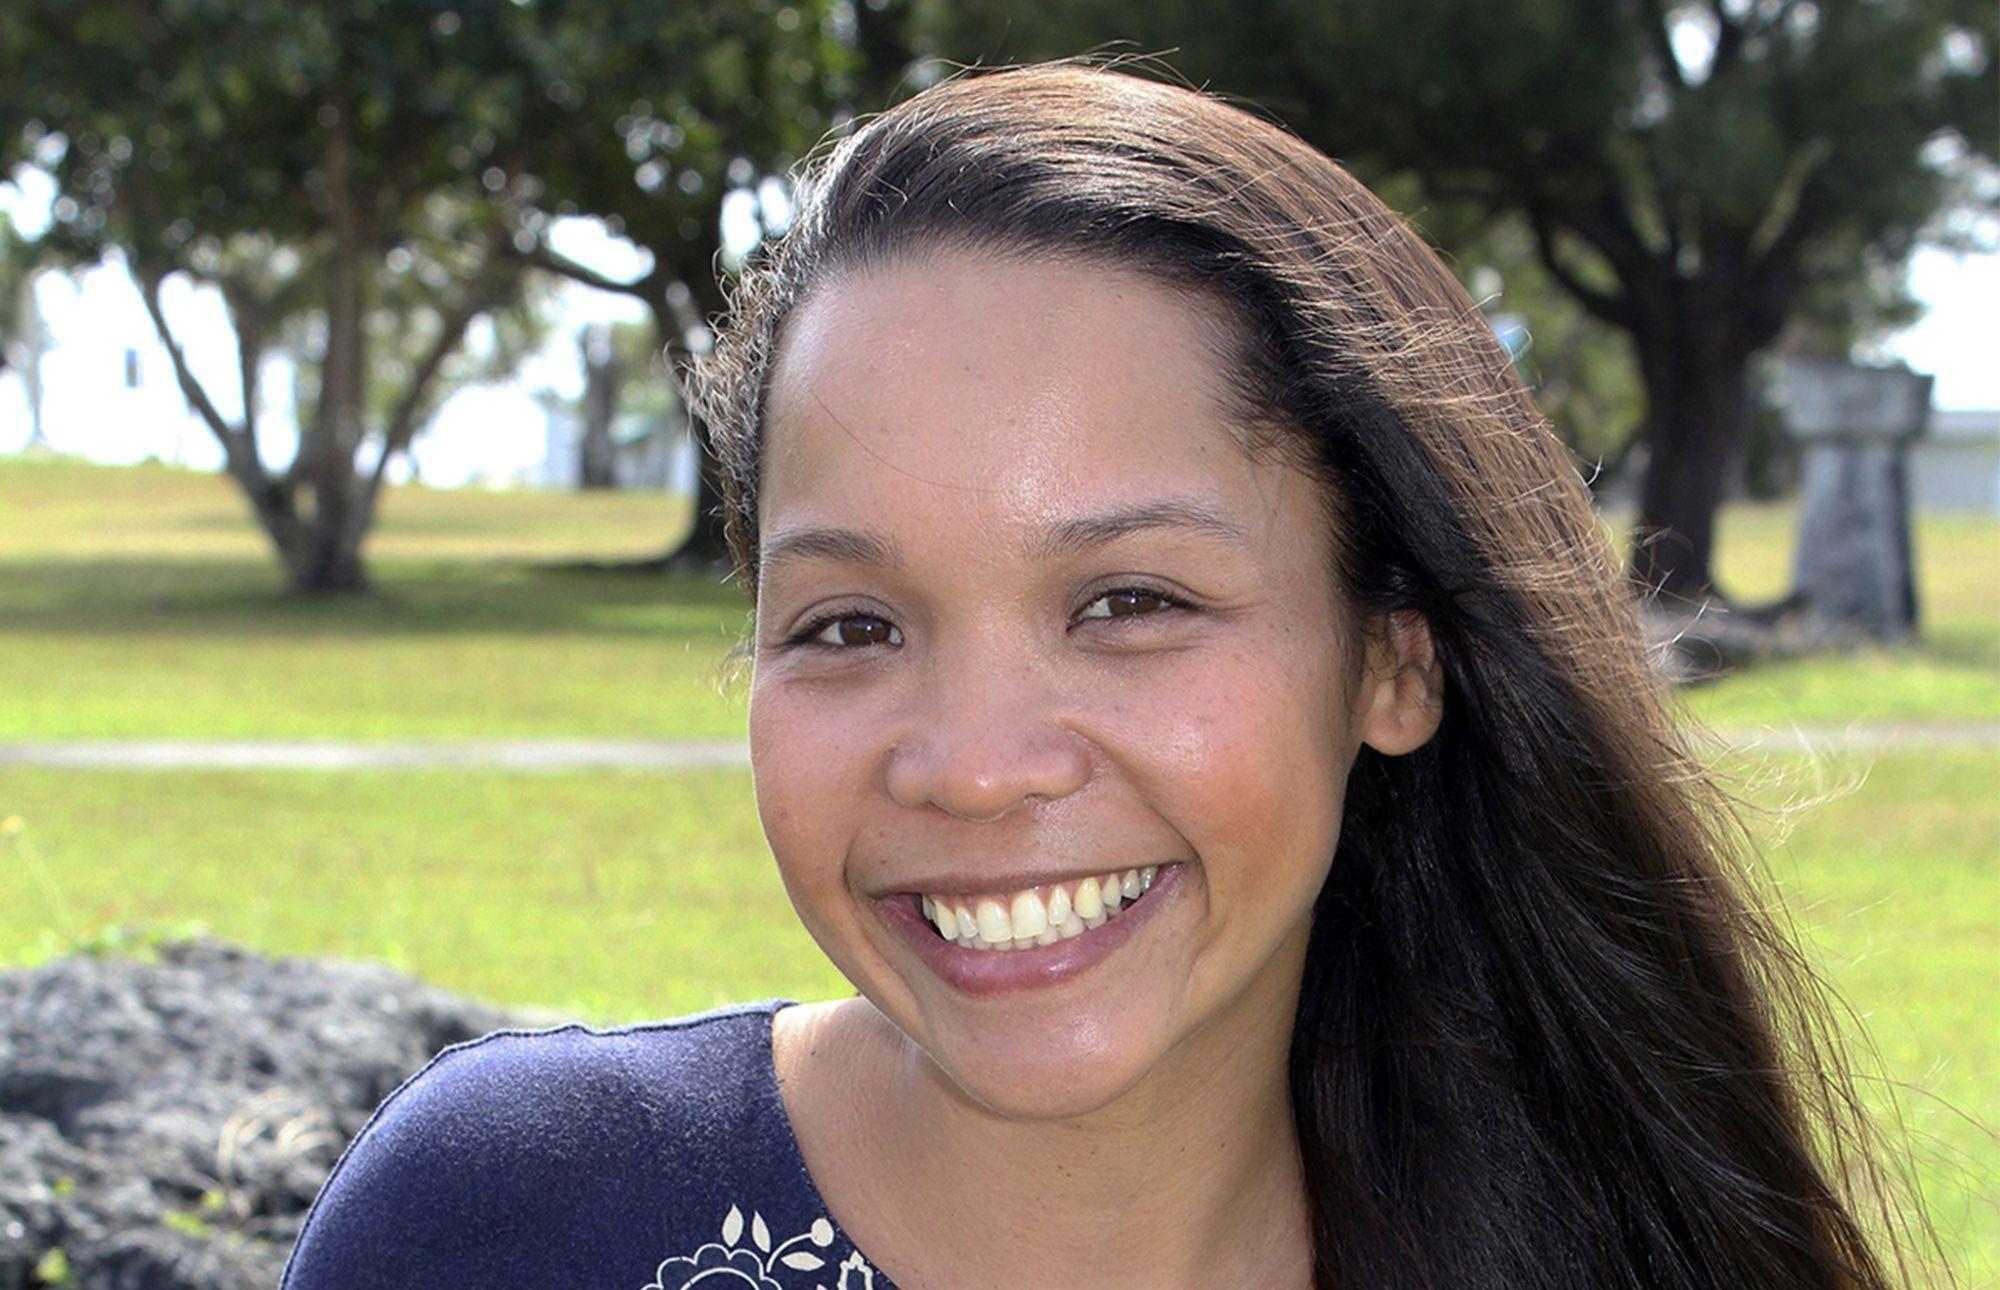 University of Guam graduate student Sophia A. Sablan